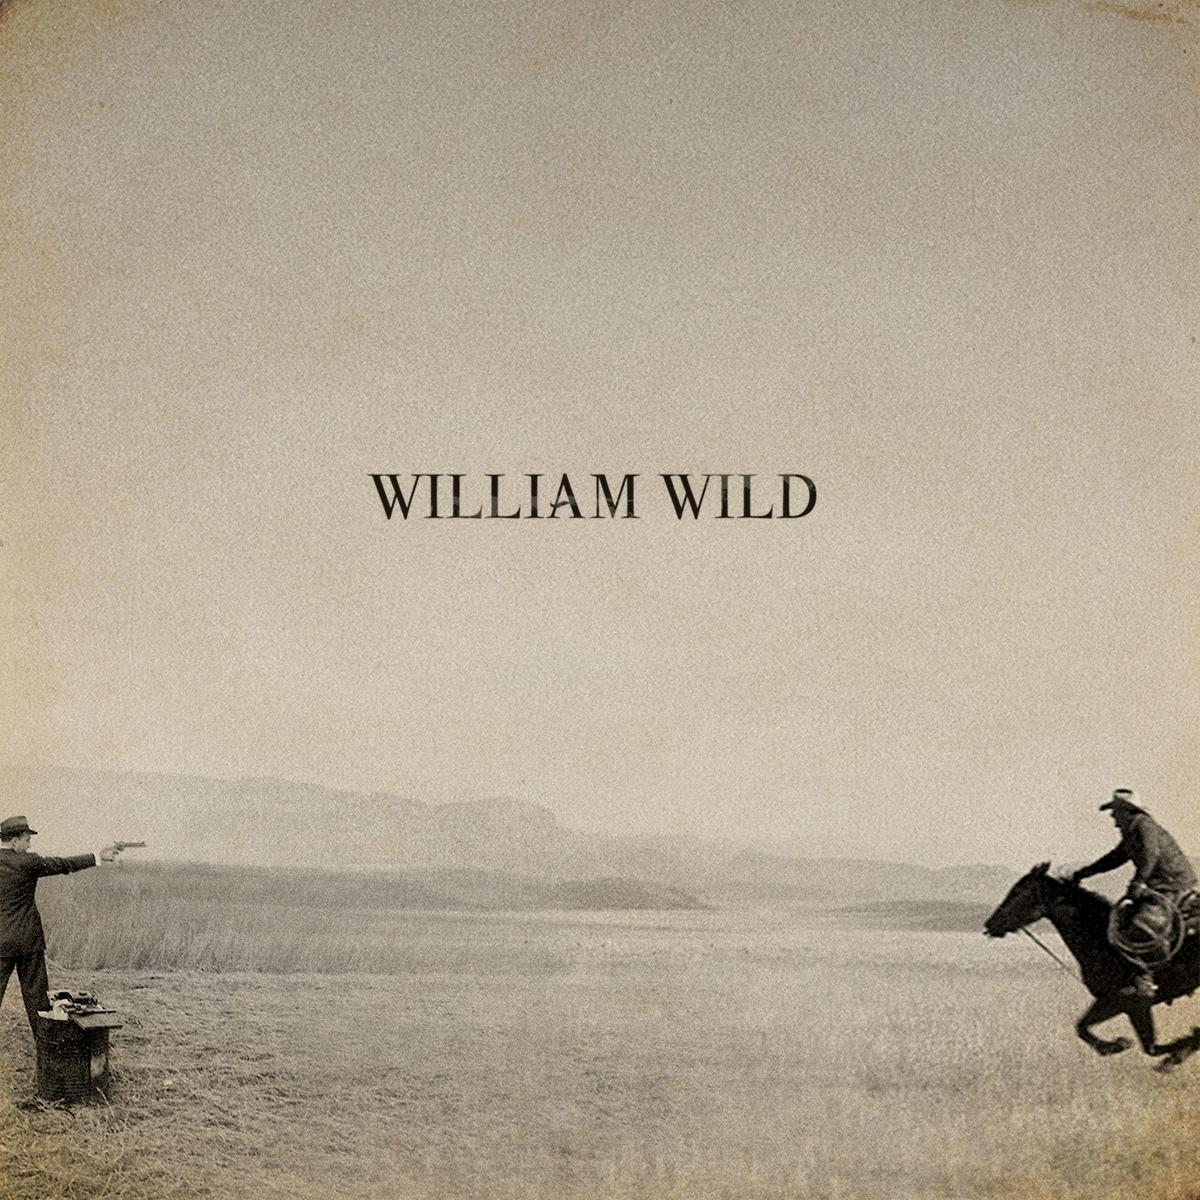 William Wild 1200x1200.jpg